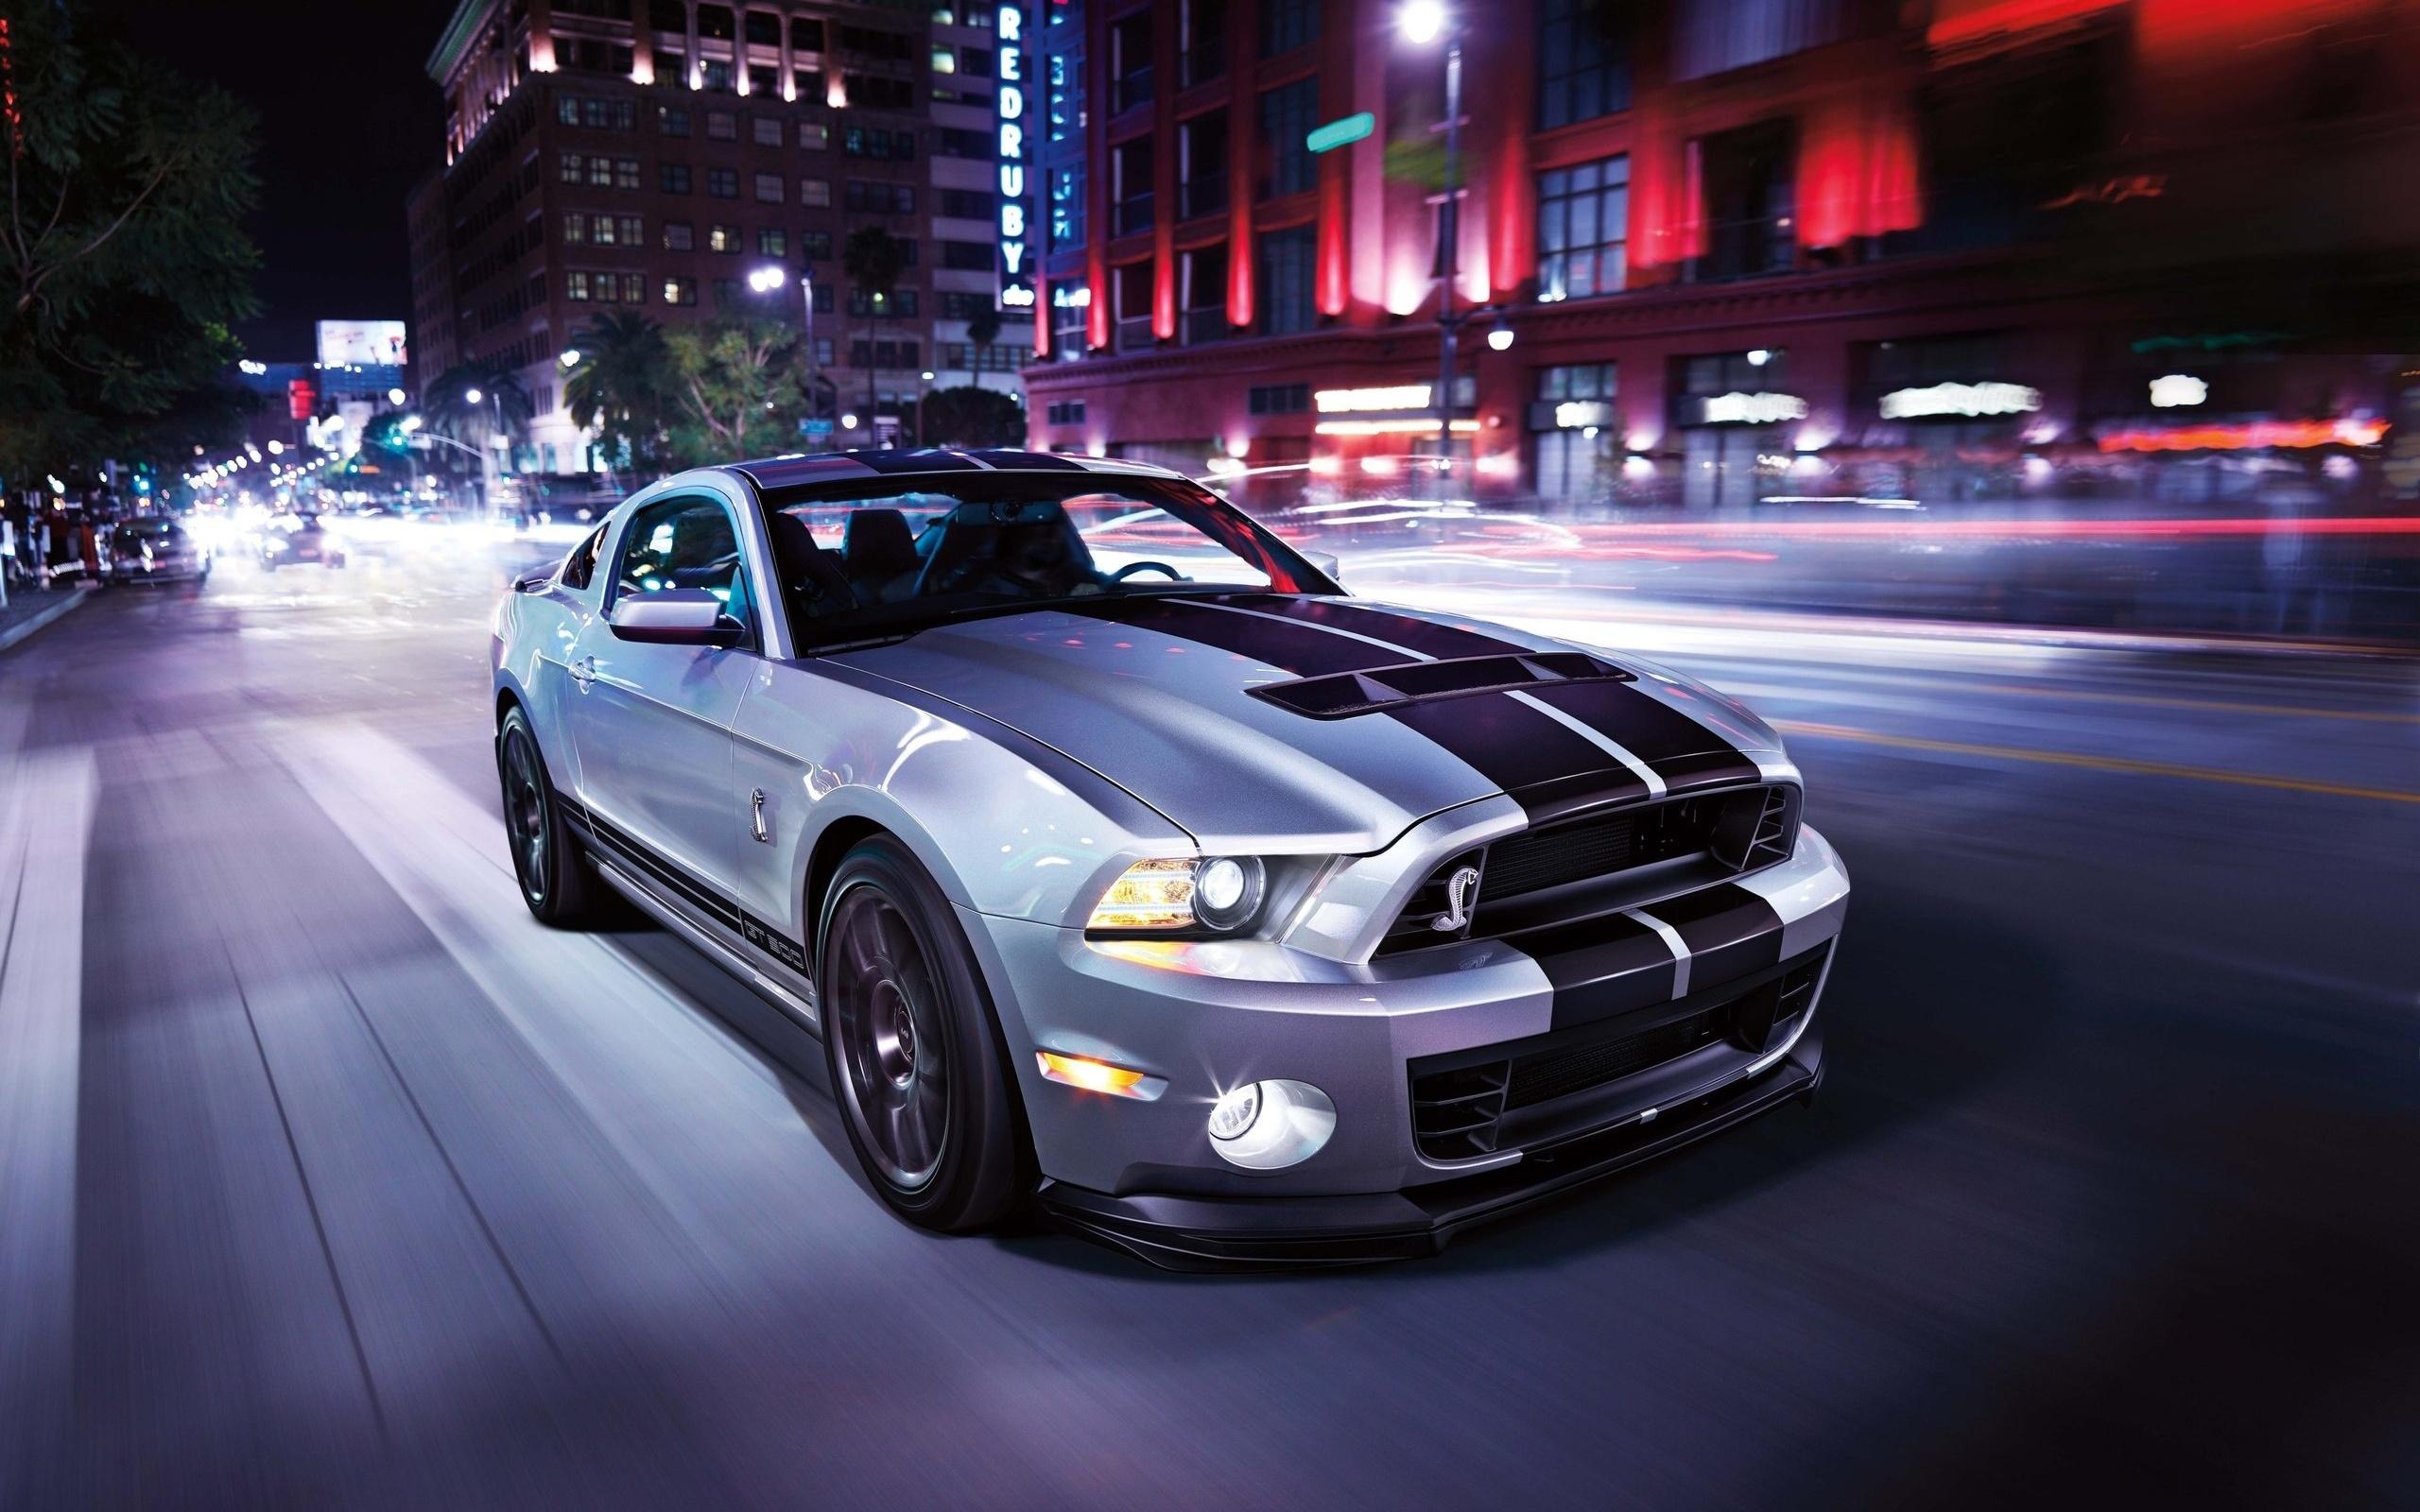 Ford Mustang дорога ночь без смс